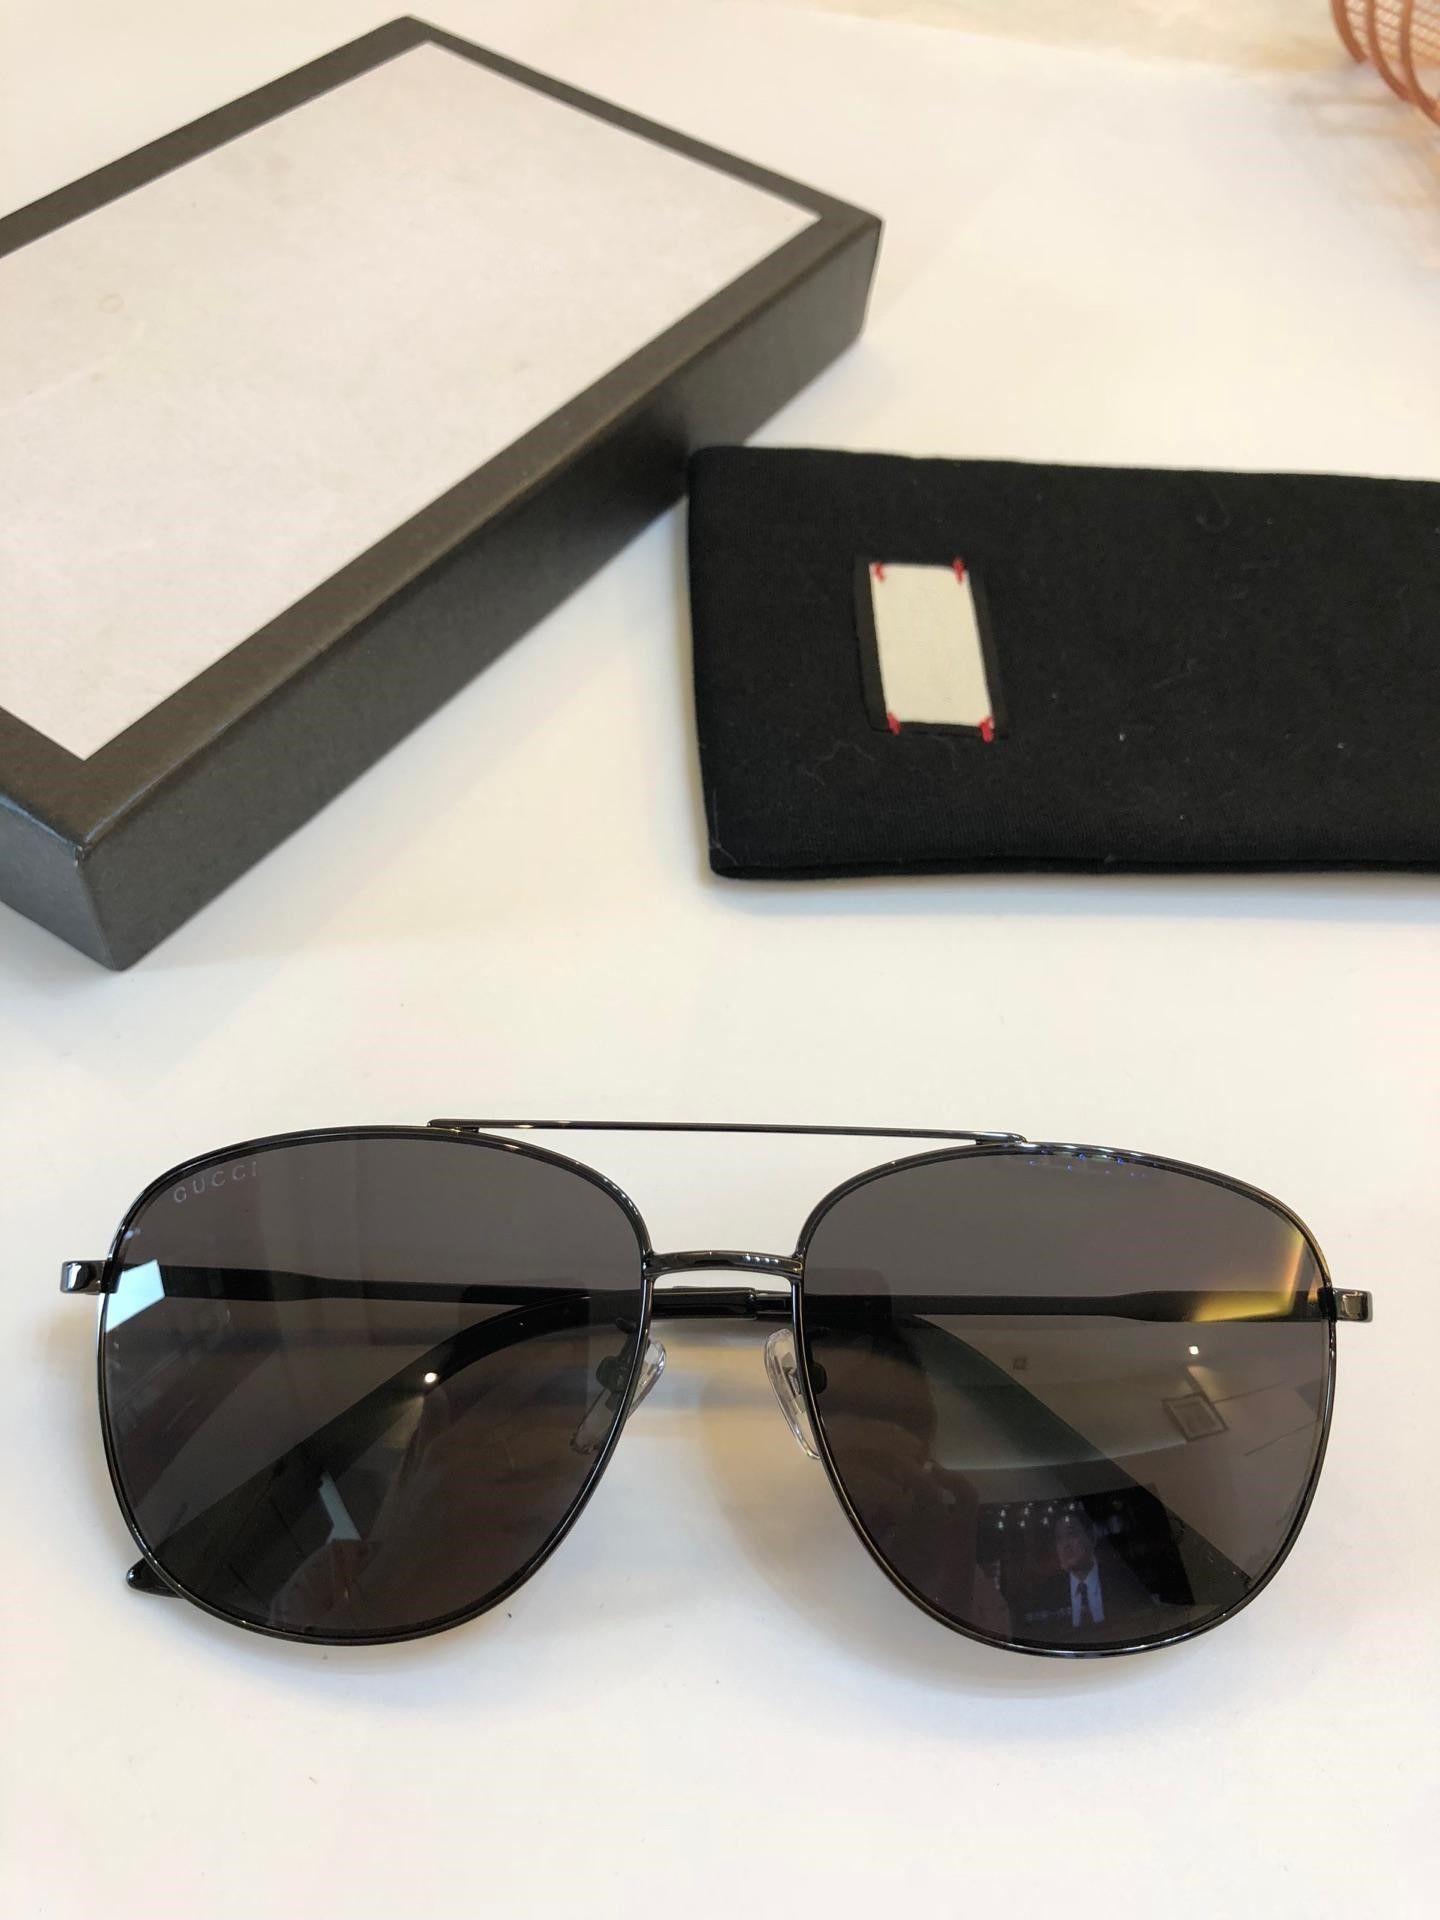 36b5216e22f Women Man Square 0410 Sunglasses Clear Glitter Frame Grey Fashion Brand  Designer Sunglasses For Women New With Box 61 16 145 Polarised Sunglasses  Baby ...